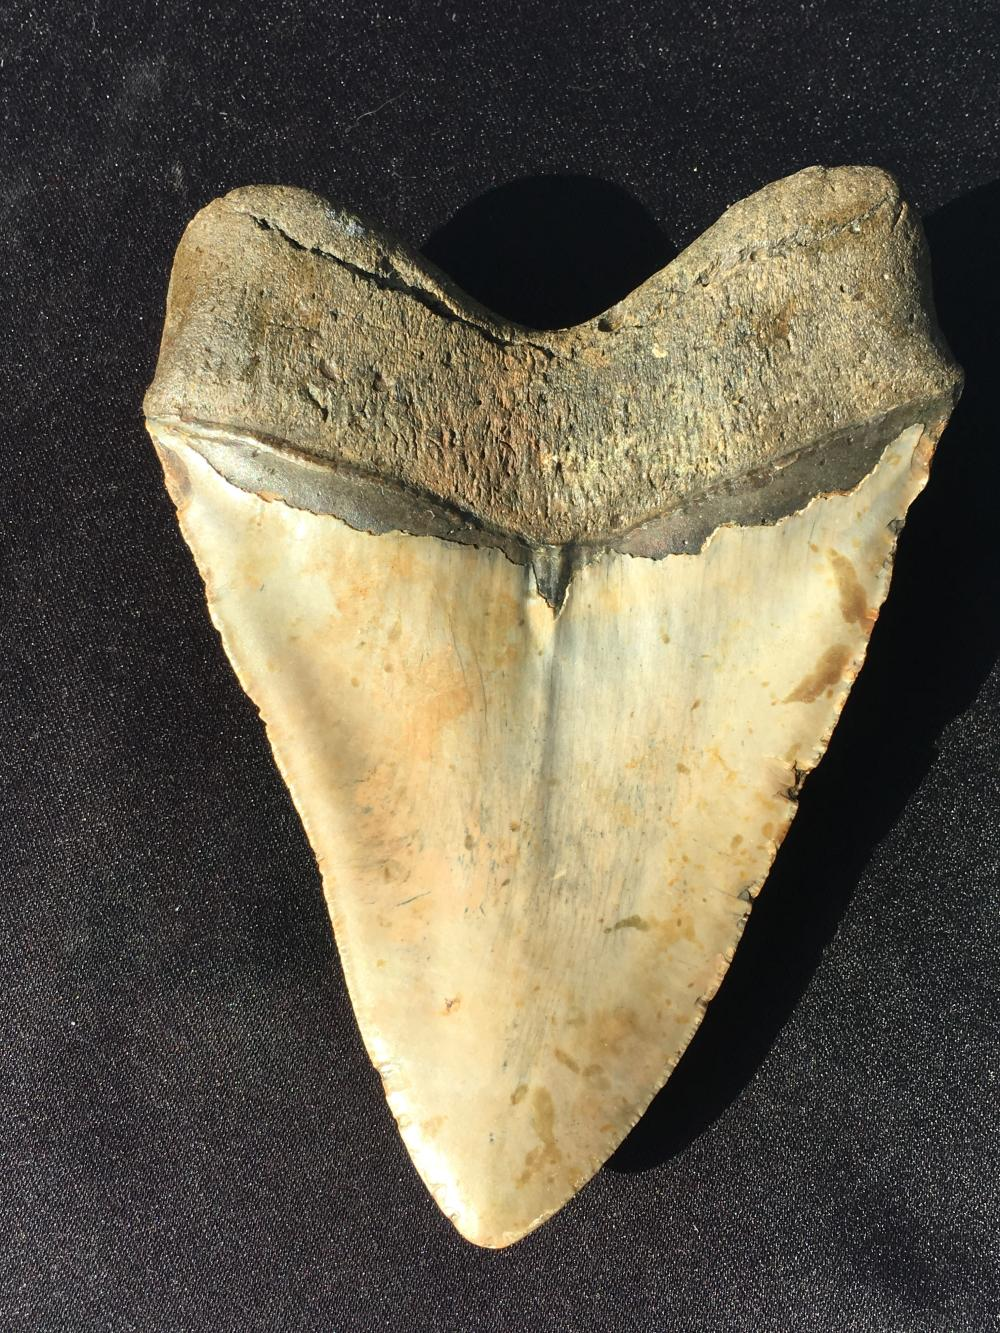 Lot 79: Megalodon, Rock, Fossil, Natural, Collectible, Specimen, Shark